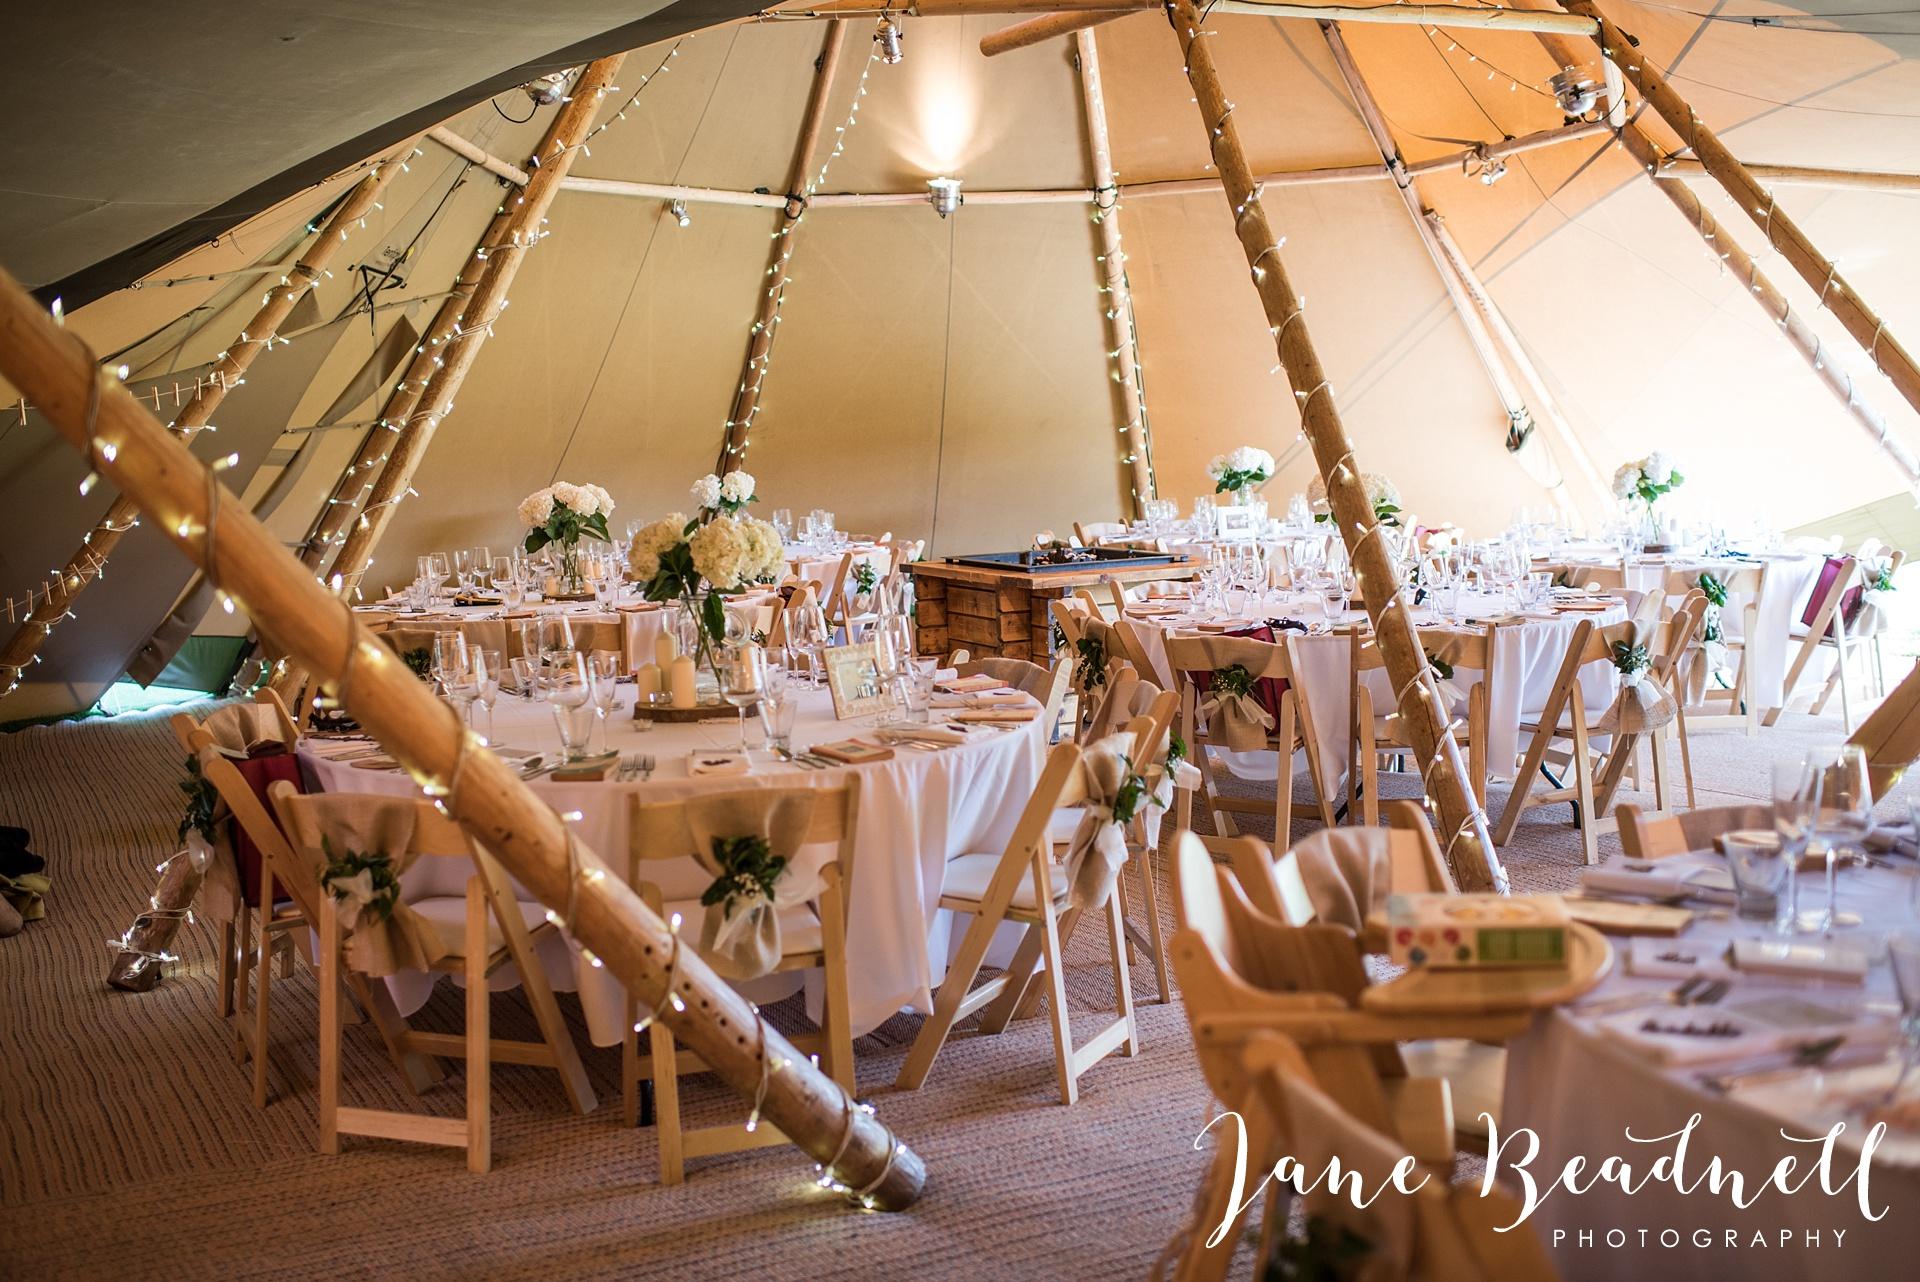 fine-art-wedding-photographer-jane-beadnell-yorkshire-wedding-photographer_0102